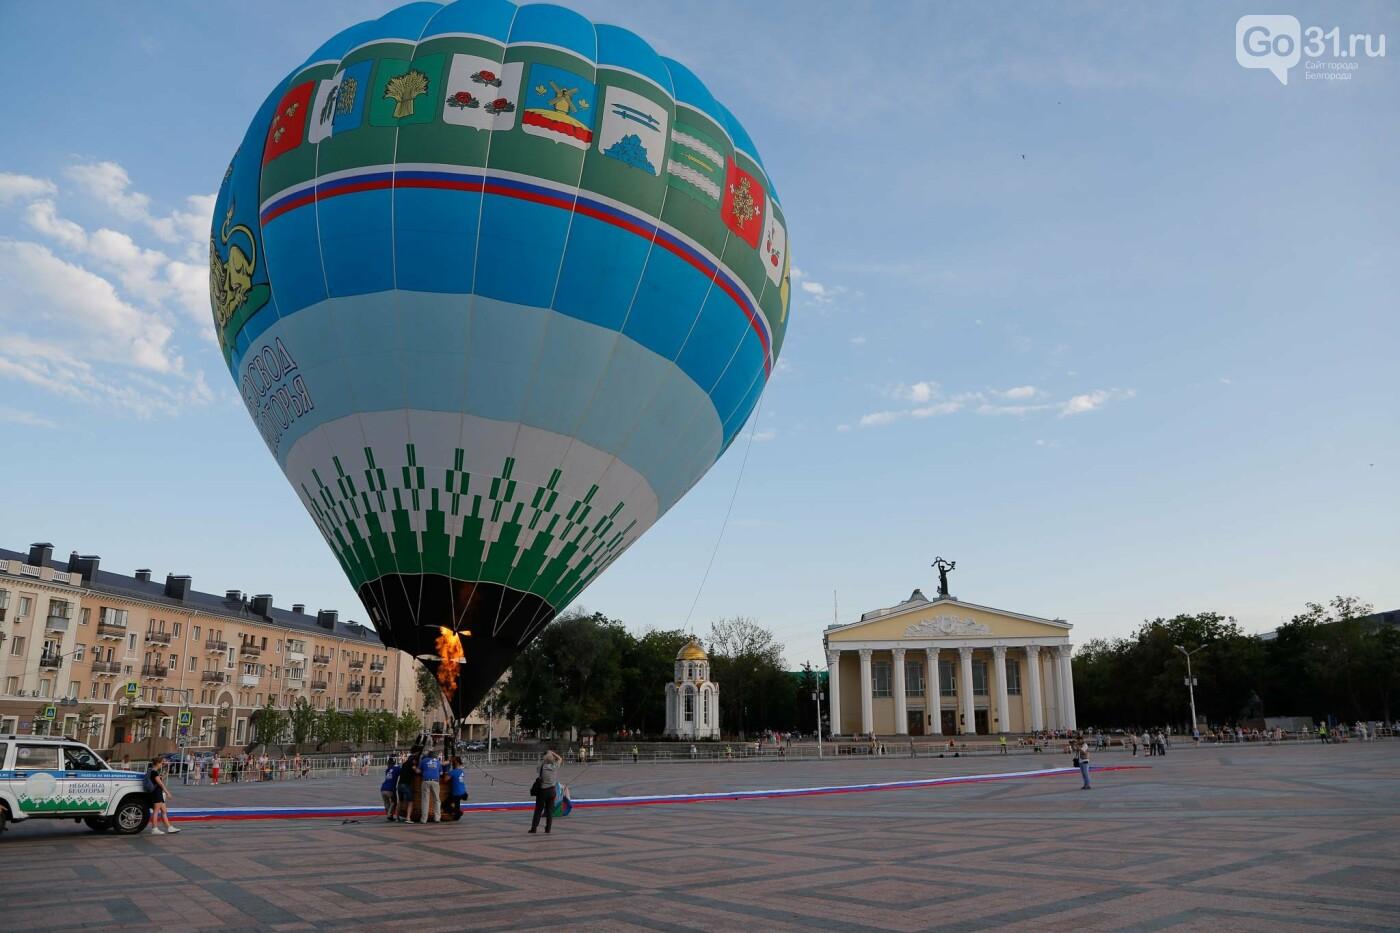 Над Белгородом пролетел аэростат с гигантским триколором, фото-19, Фото: Антон Вергун